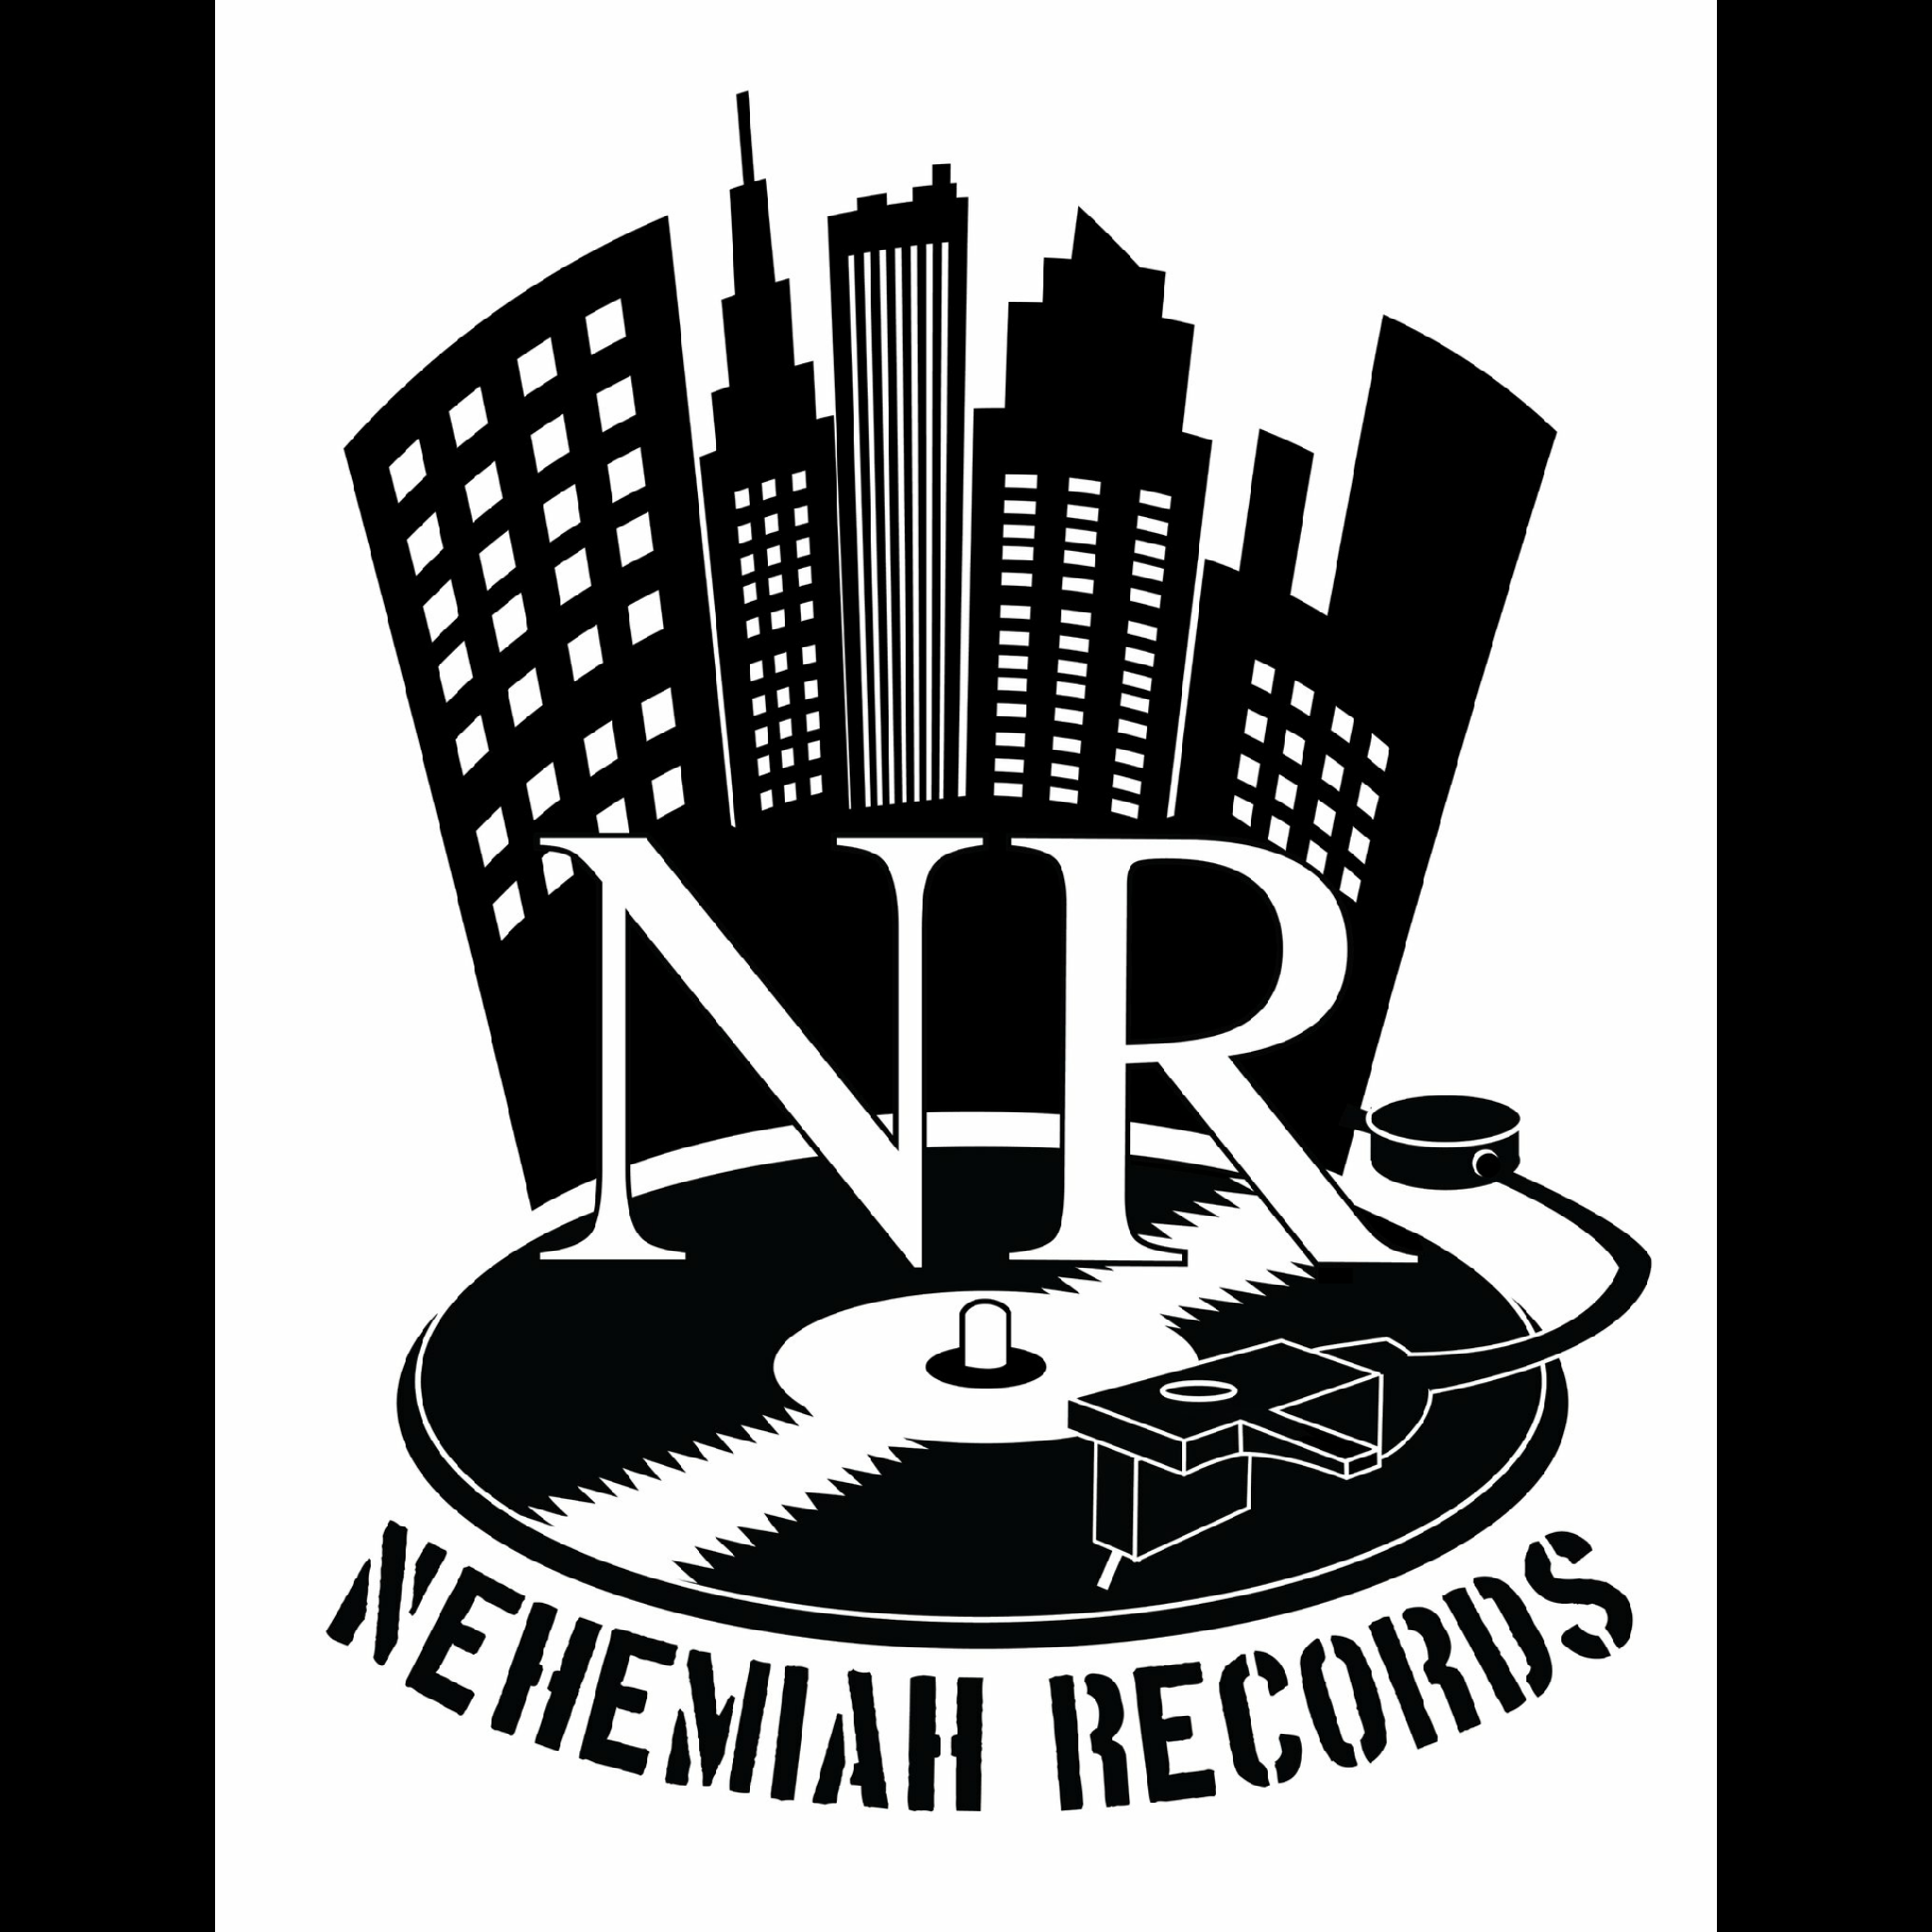 Nehemiah Records